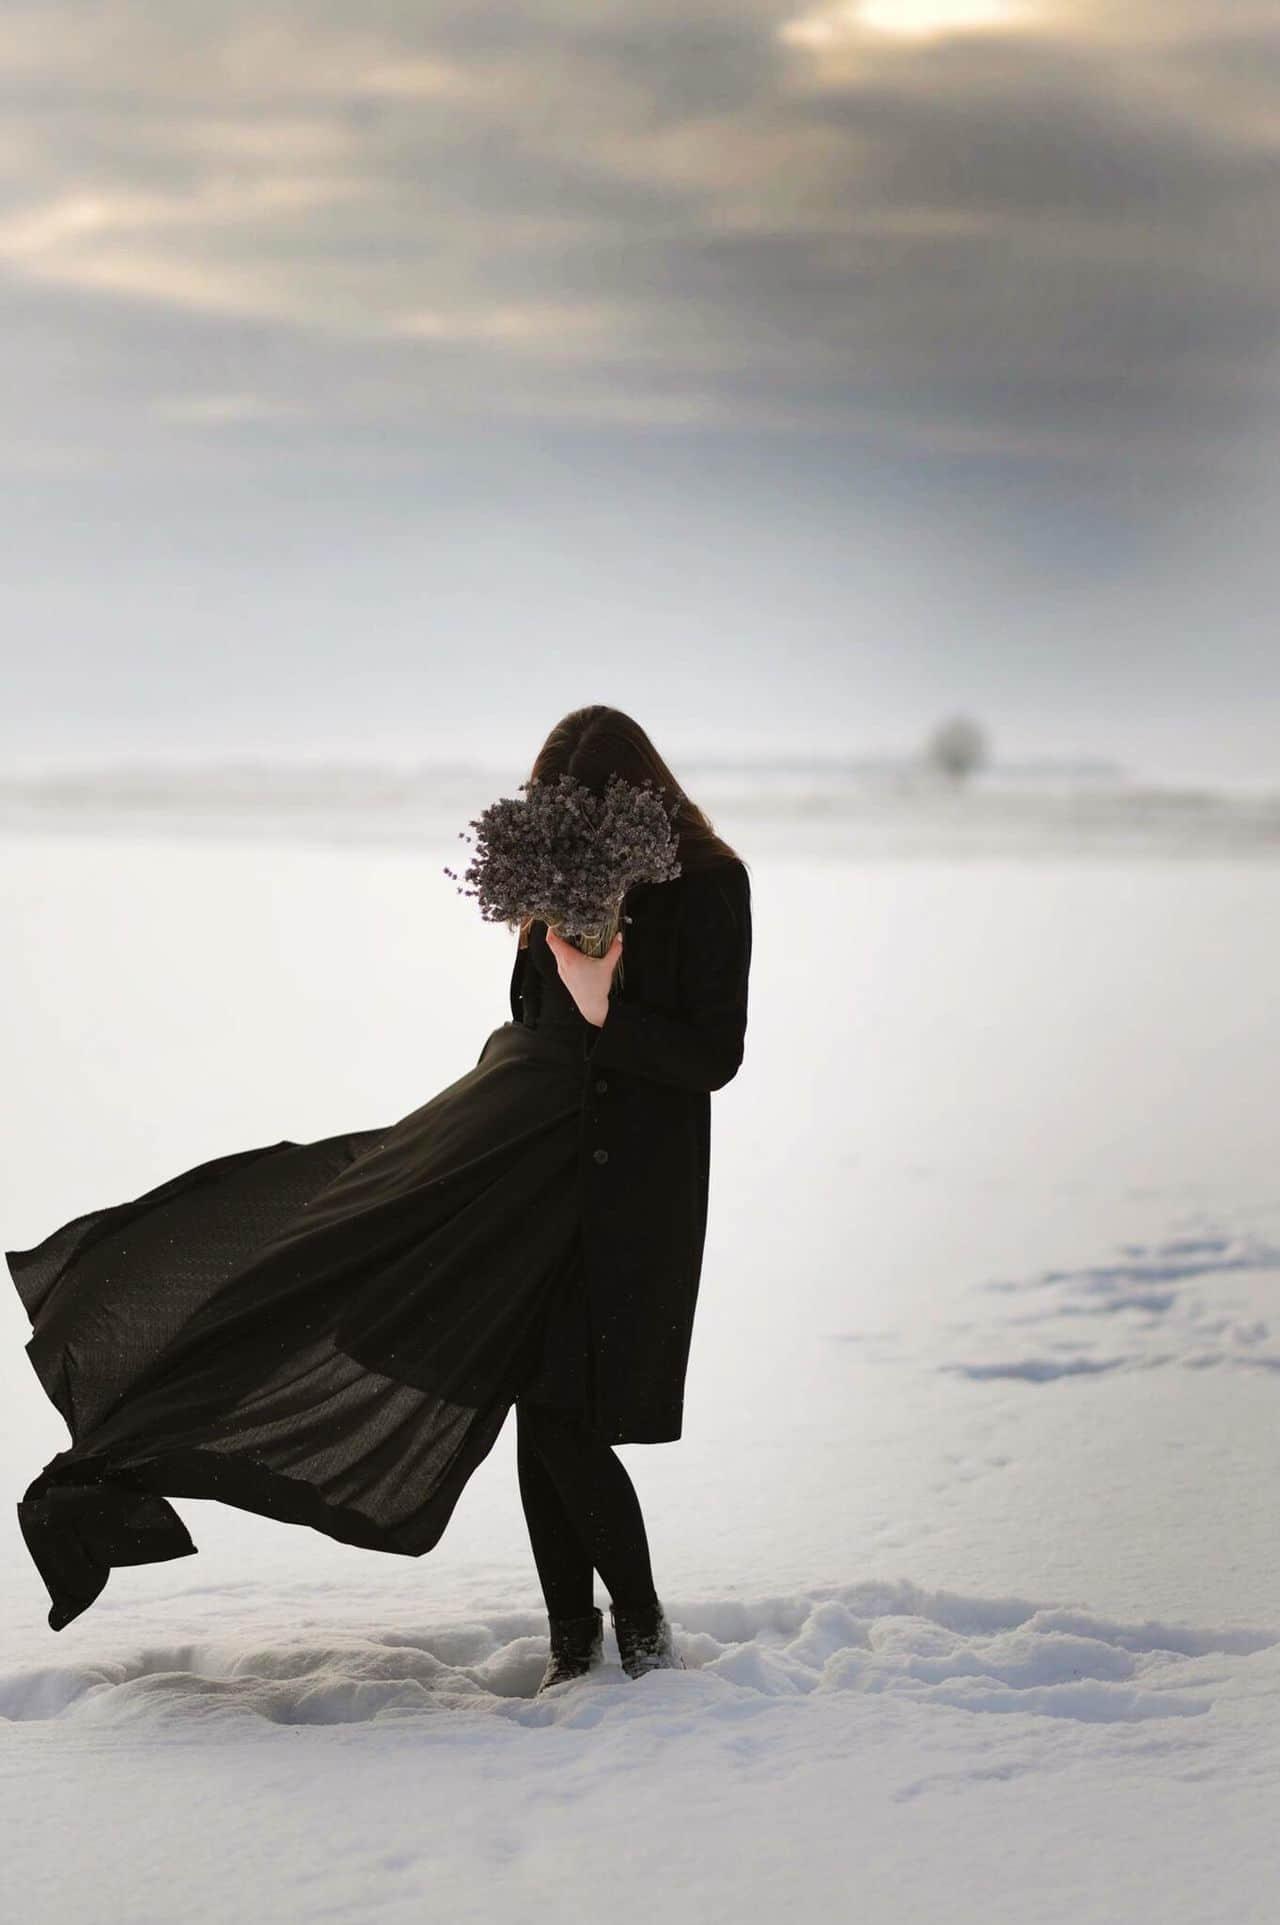 Ruta Kenstaviciute 安静的镜头 生活摄影欣赏